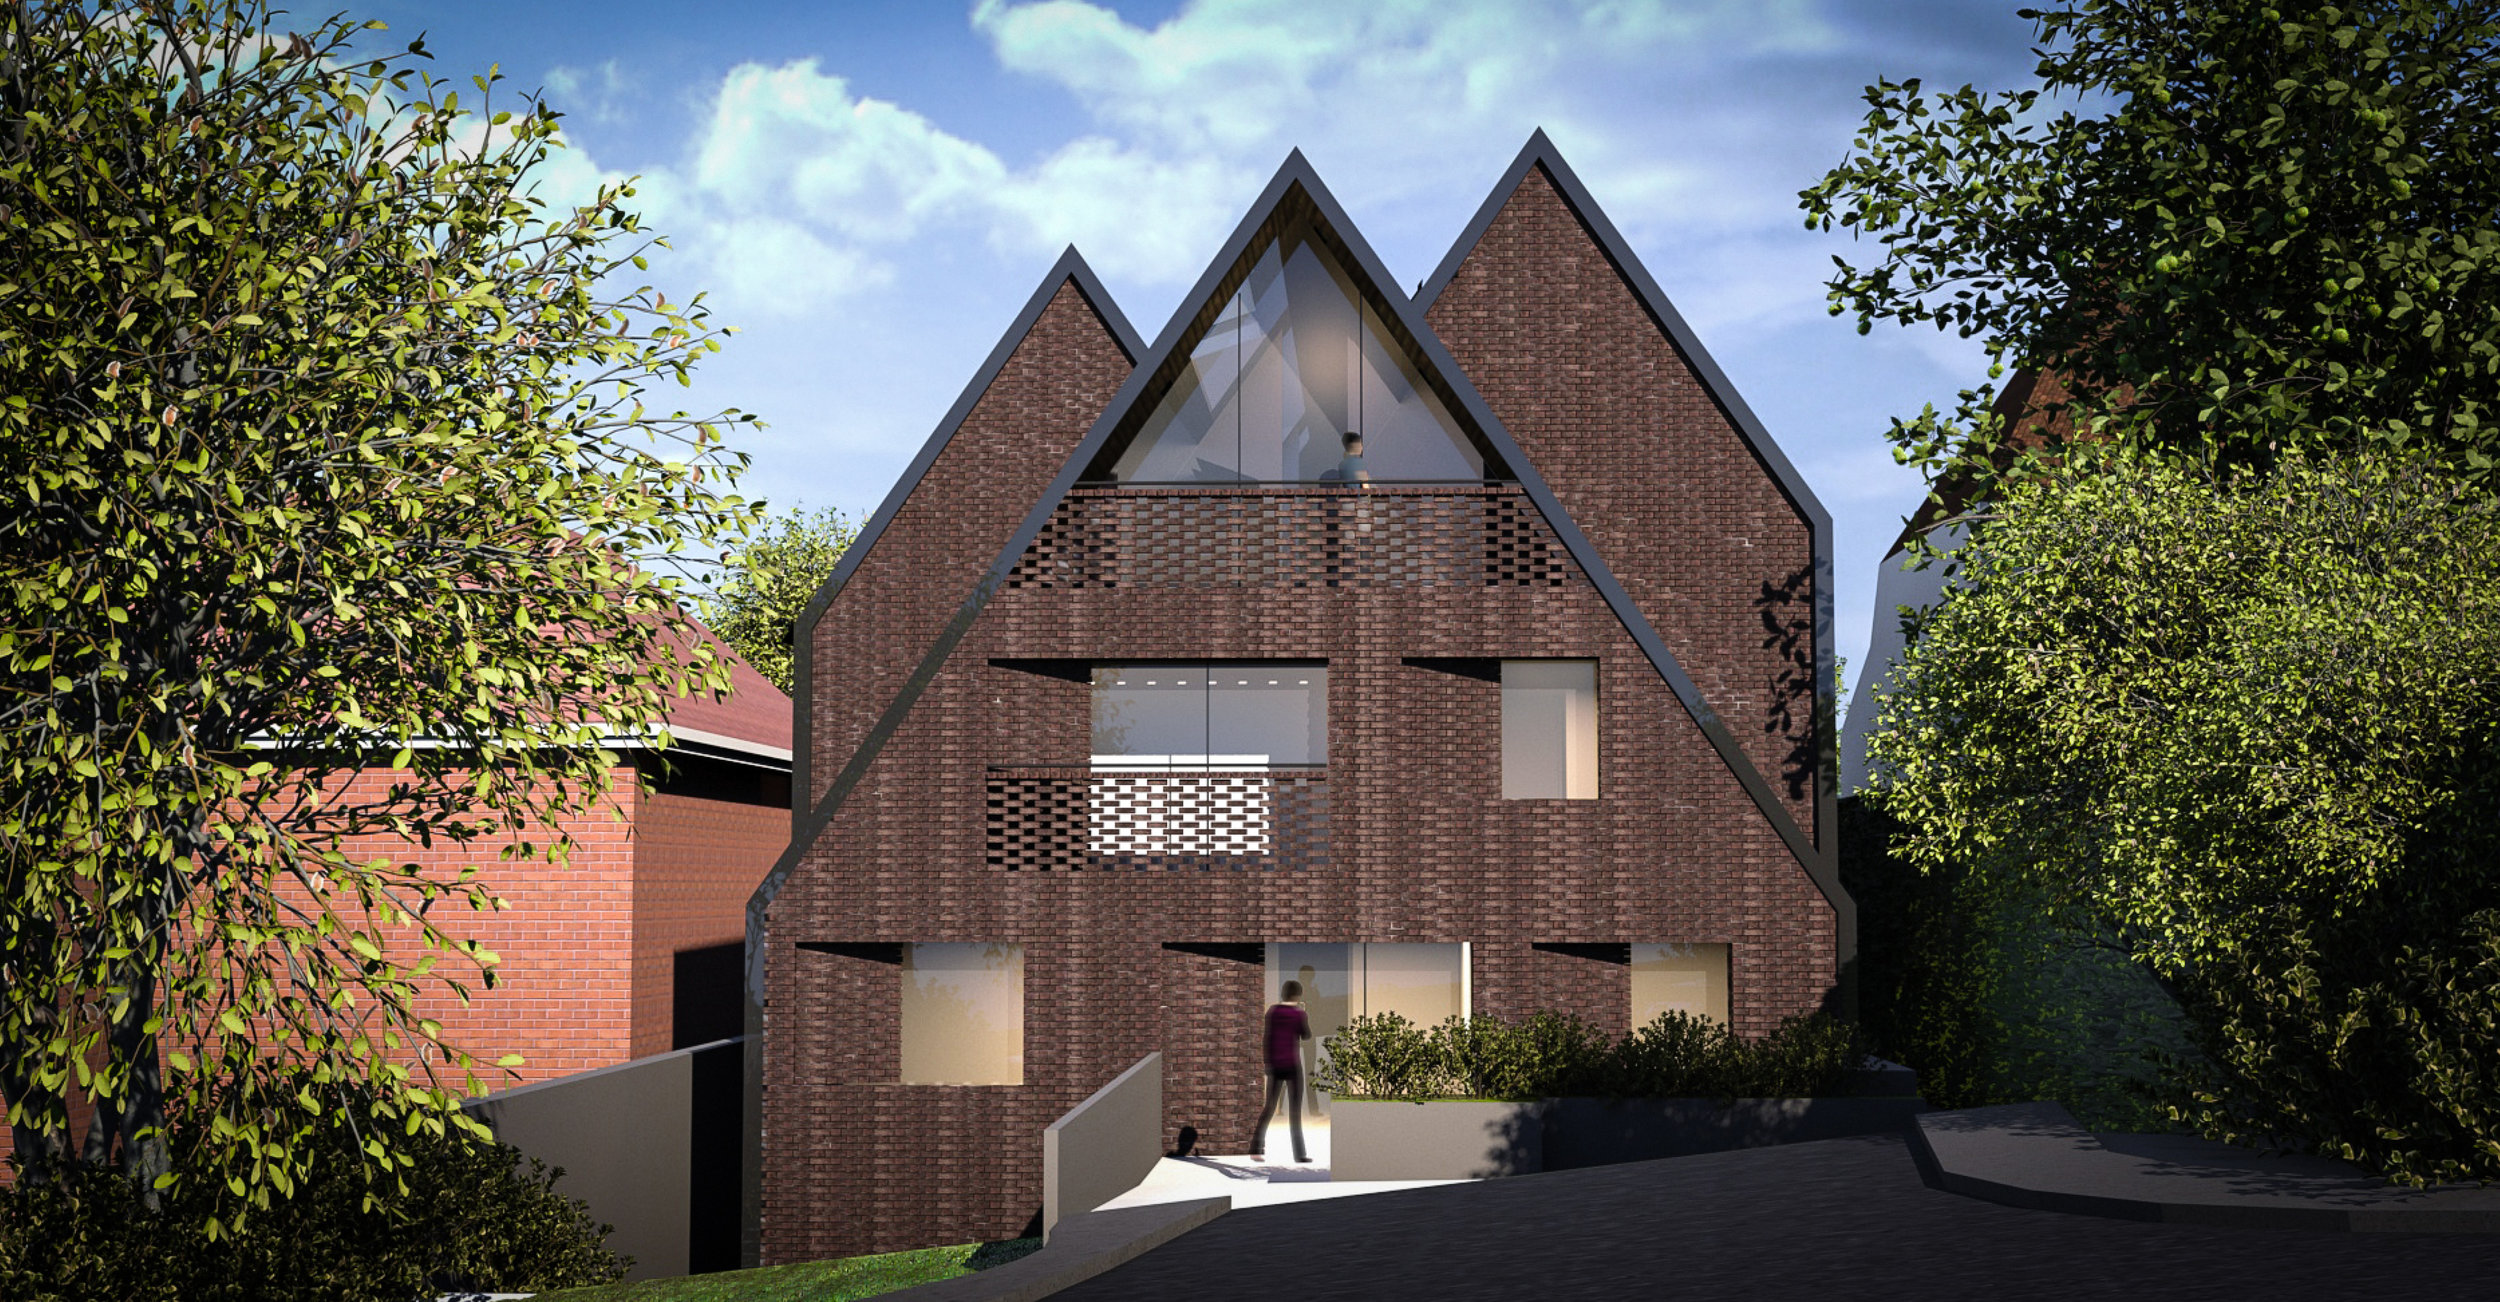 © Copyright Studio DS 2018 - the Multi Home Smart Home Rear Elevation CGI